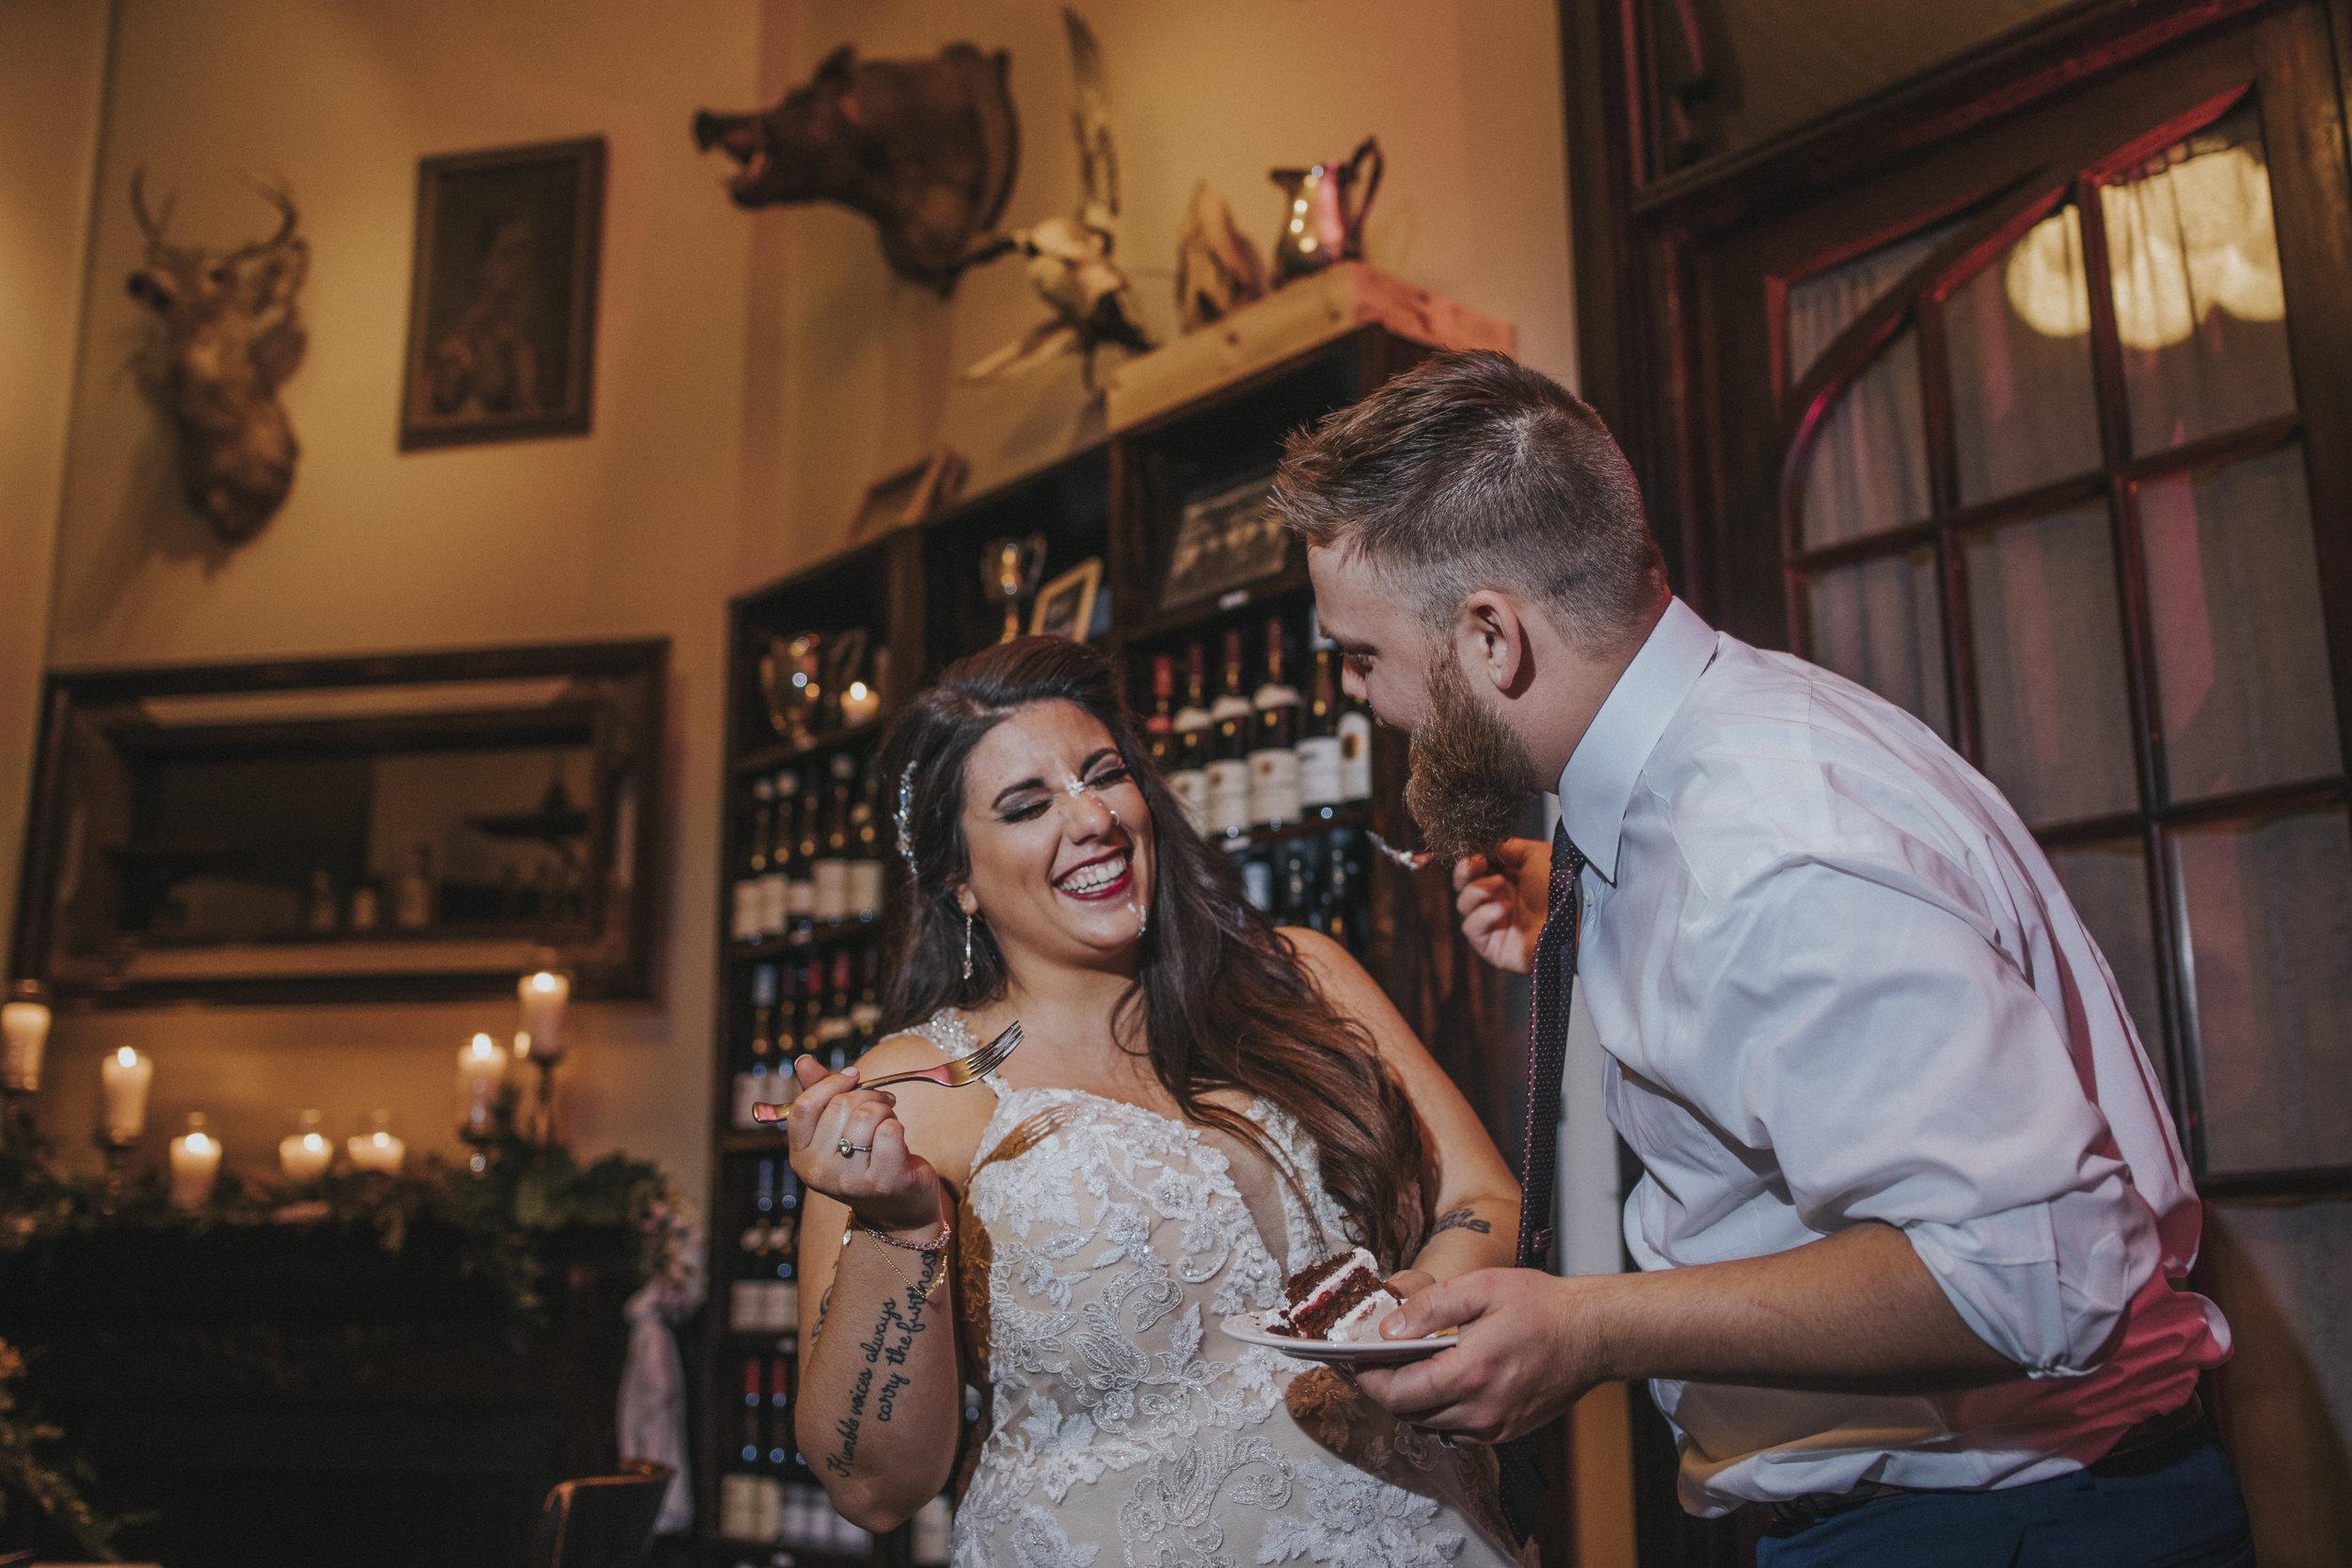 226 tiny-luxe-weddings-custom-elopement-summer-omaha-old-market.jpg